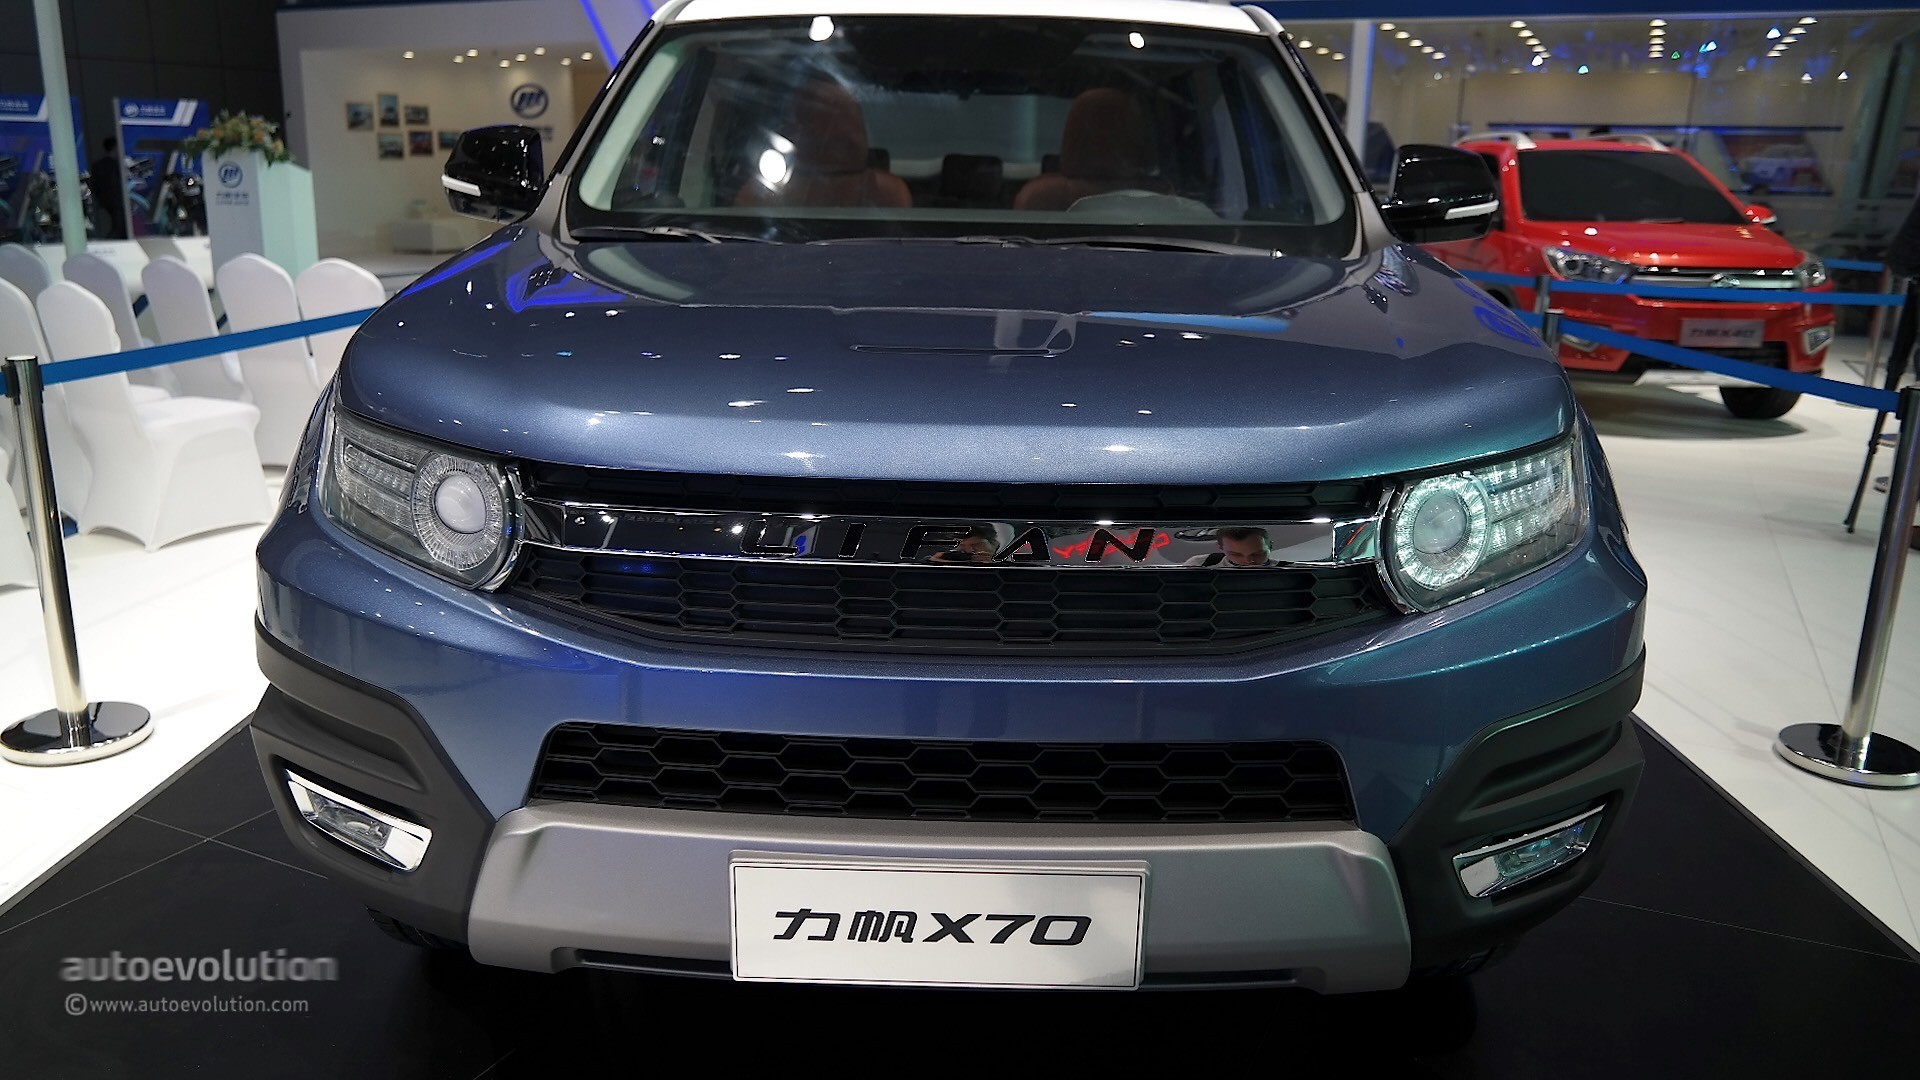 Lifan X70 Suv Concept Takes A Bow At Auto Shanghai 2015 Autoevolution